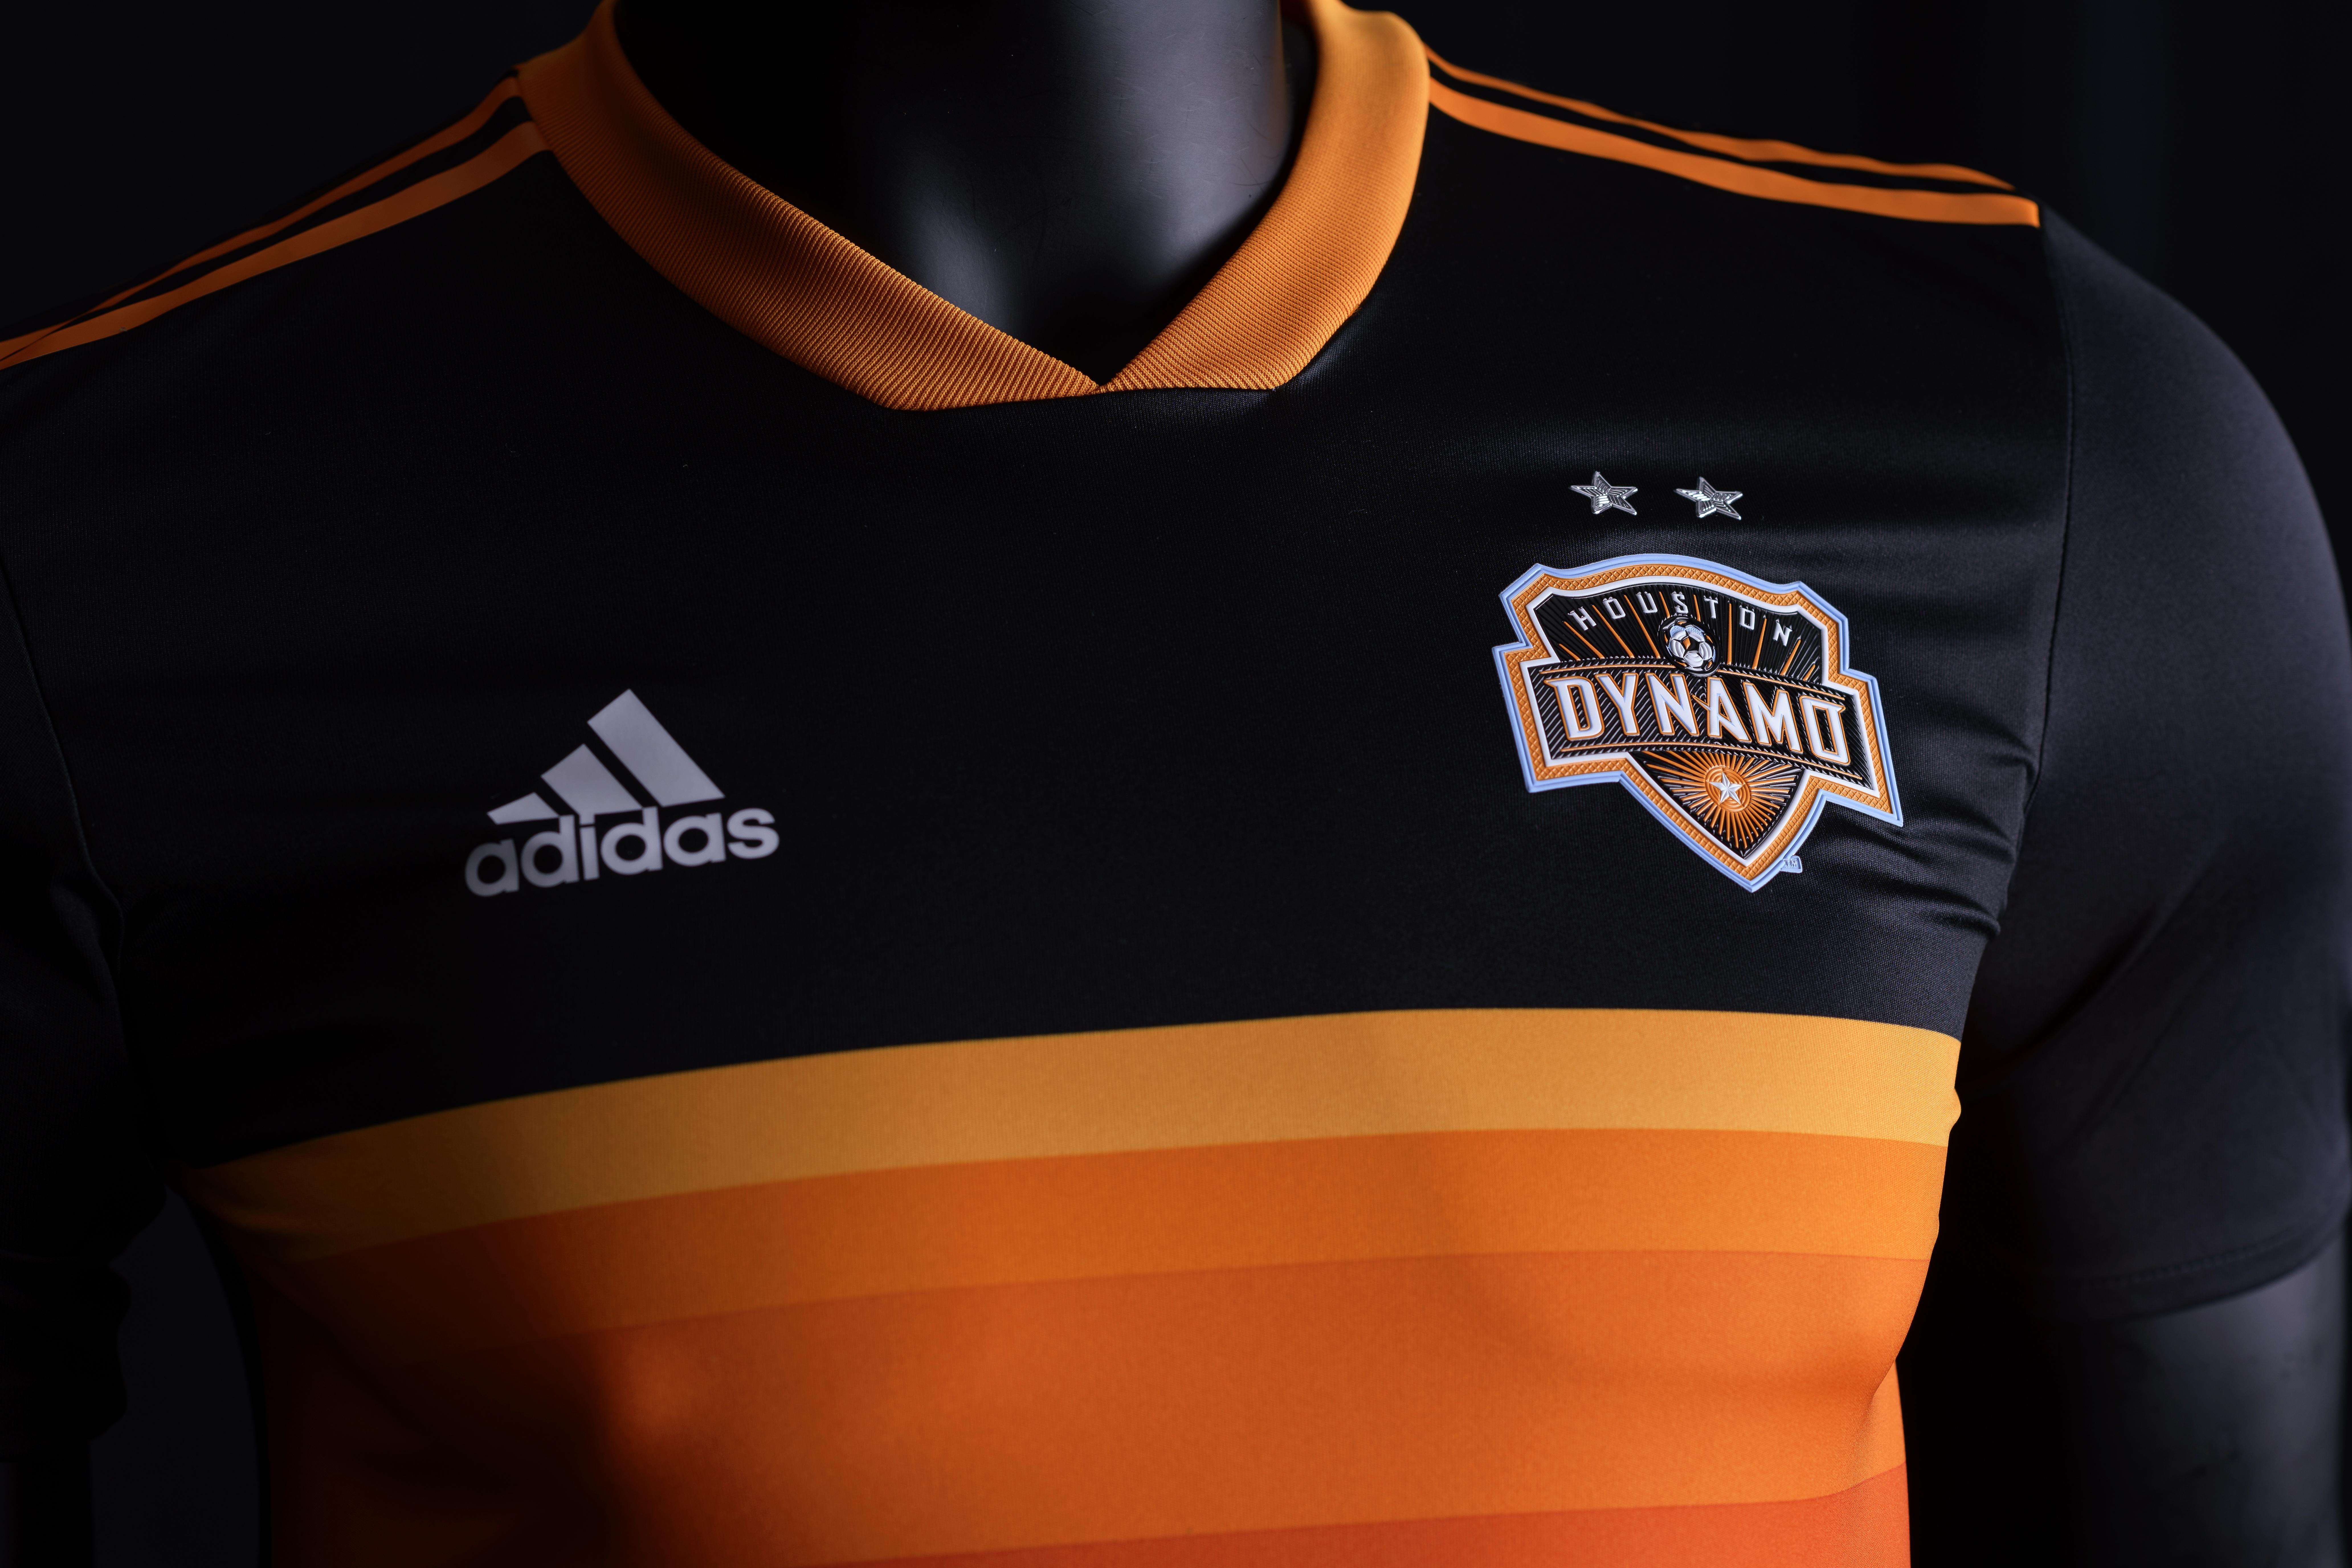 2018 Dynamo Alternate Jersey  ed3c7ce41